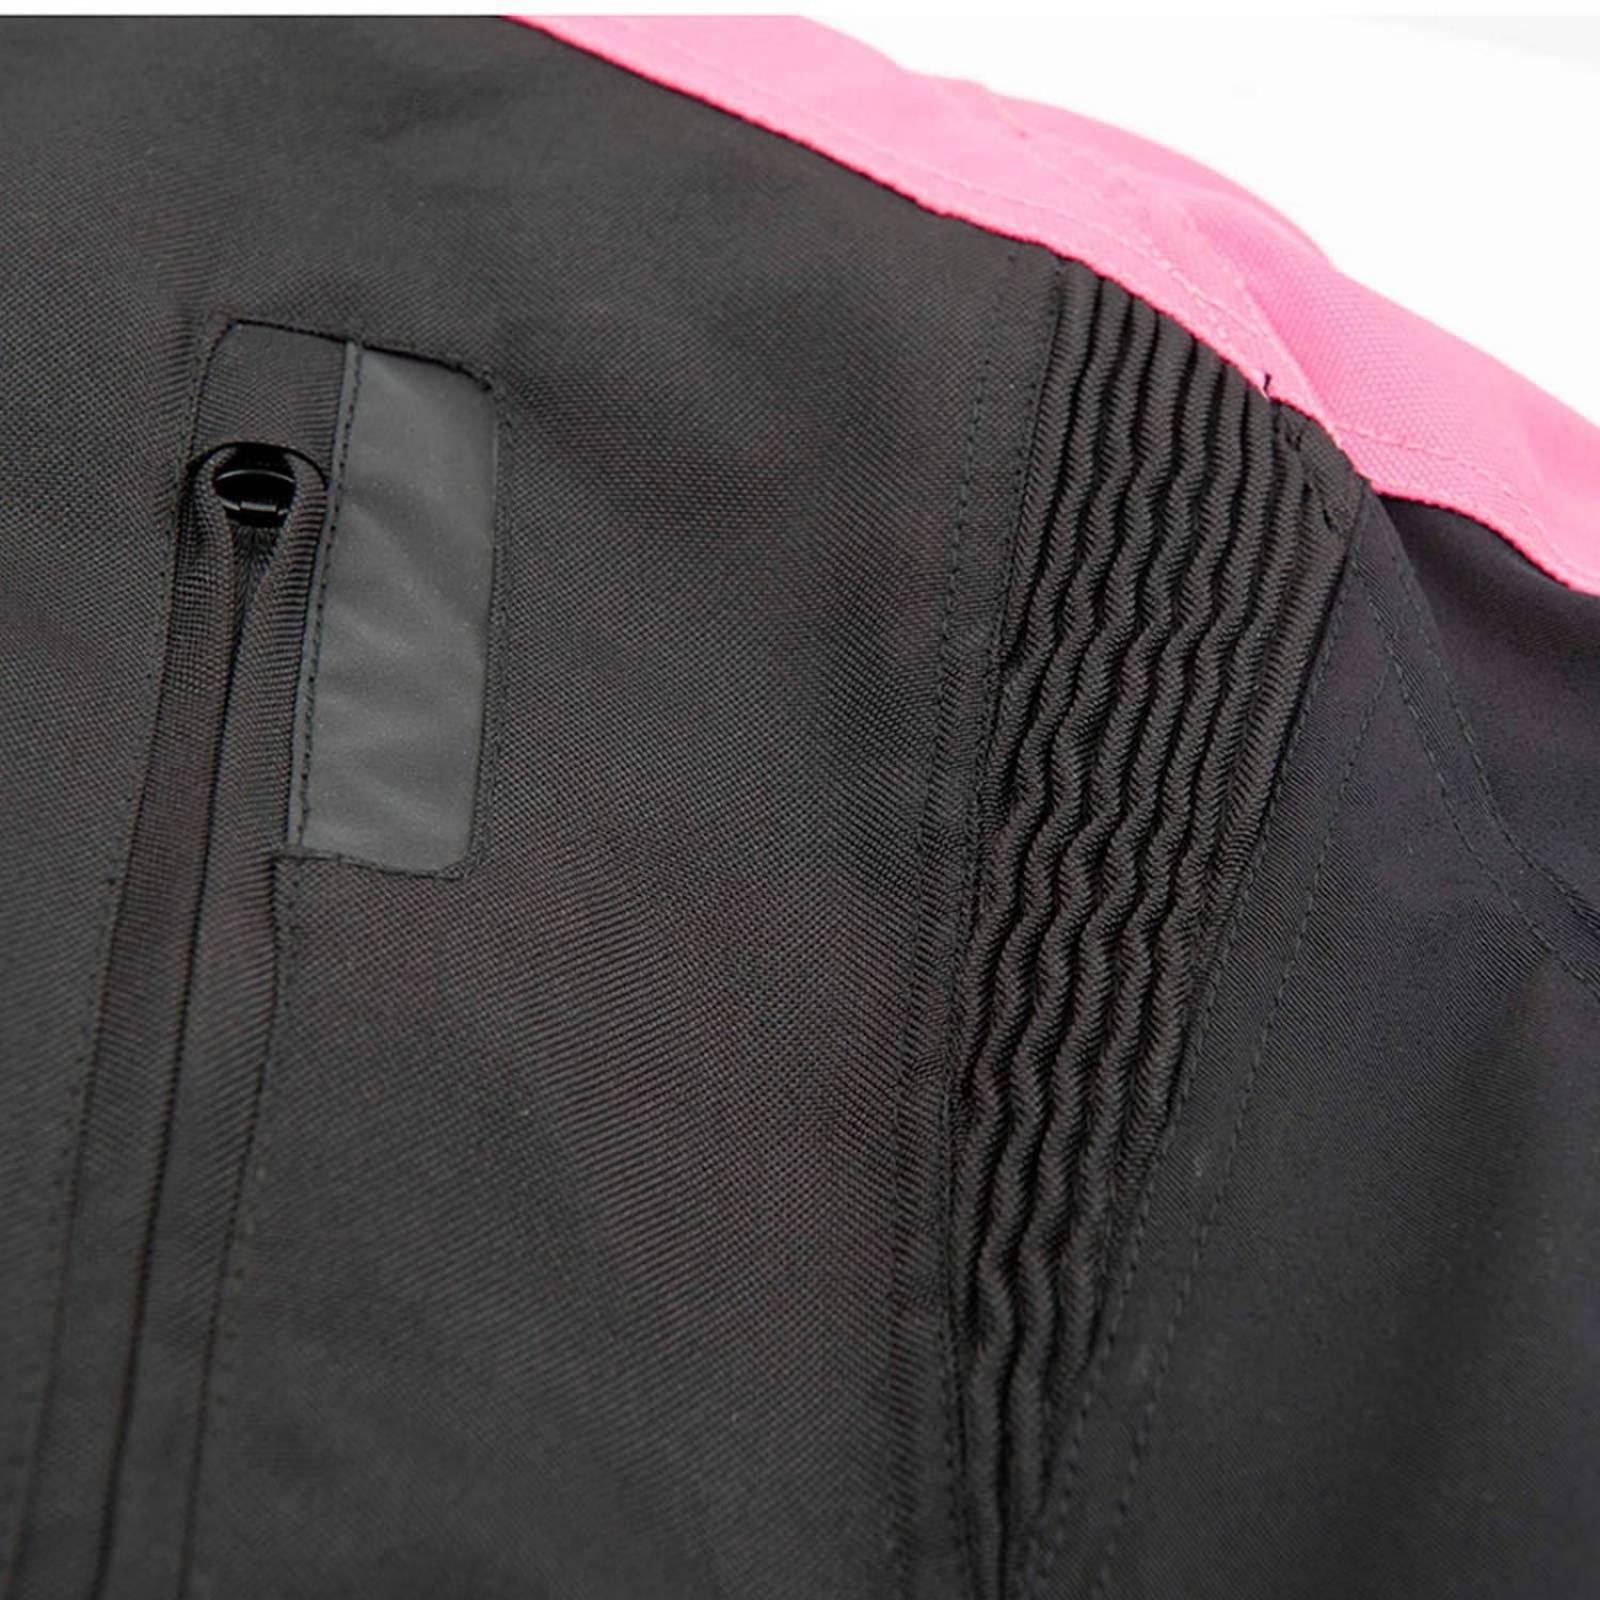 Chamarra Moto de Mujer Joe Rocket Victoria C.E. Impermeable Rosa